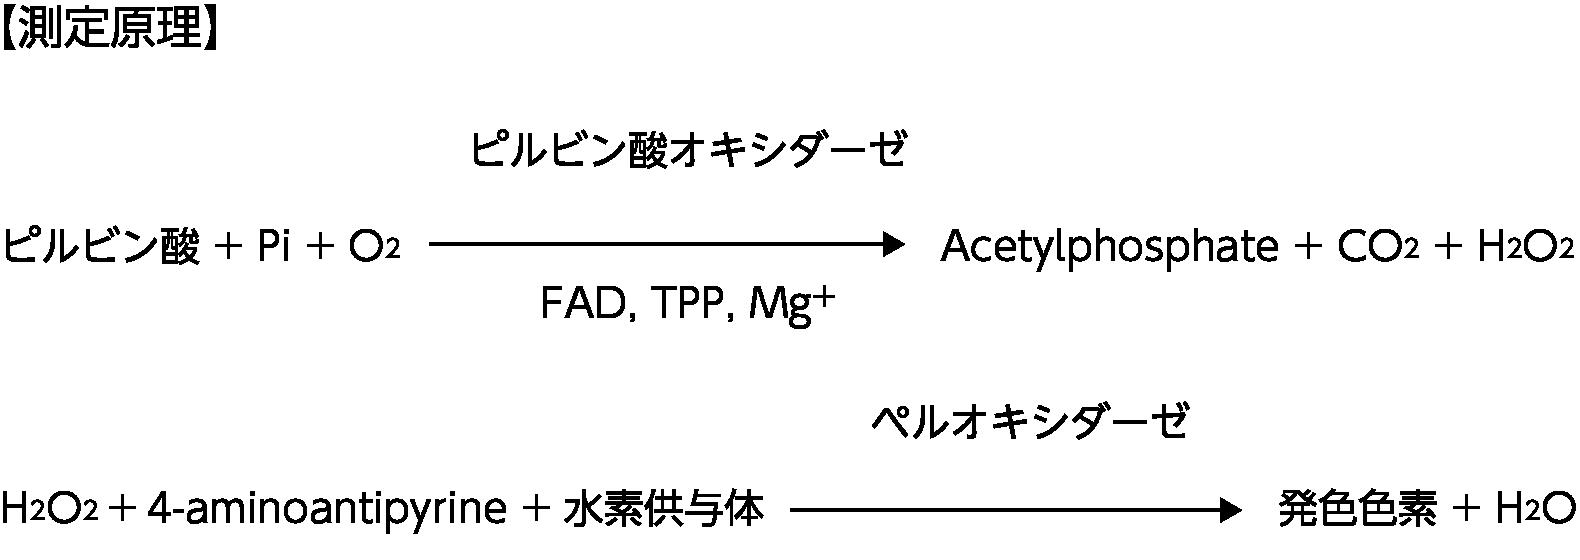 pyruvic-acid-pic